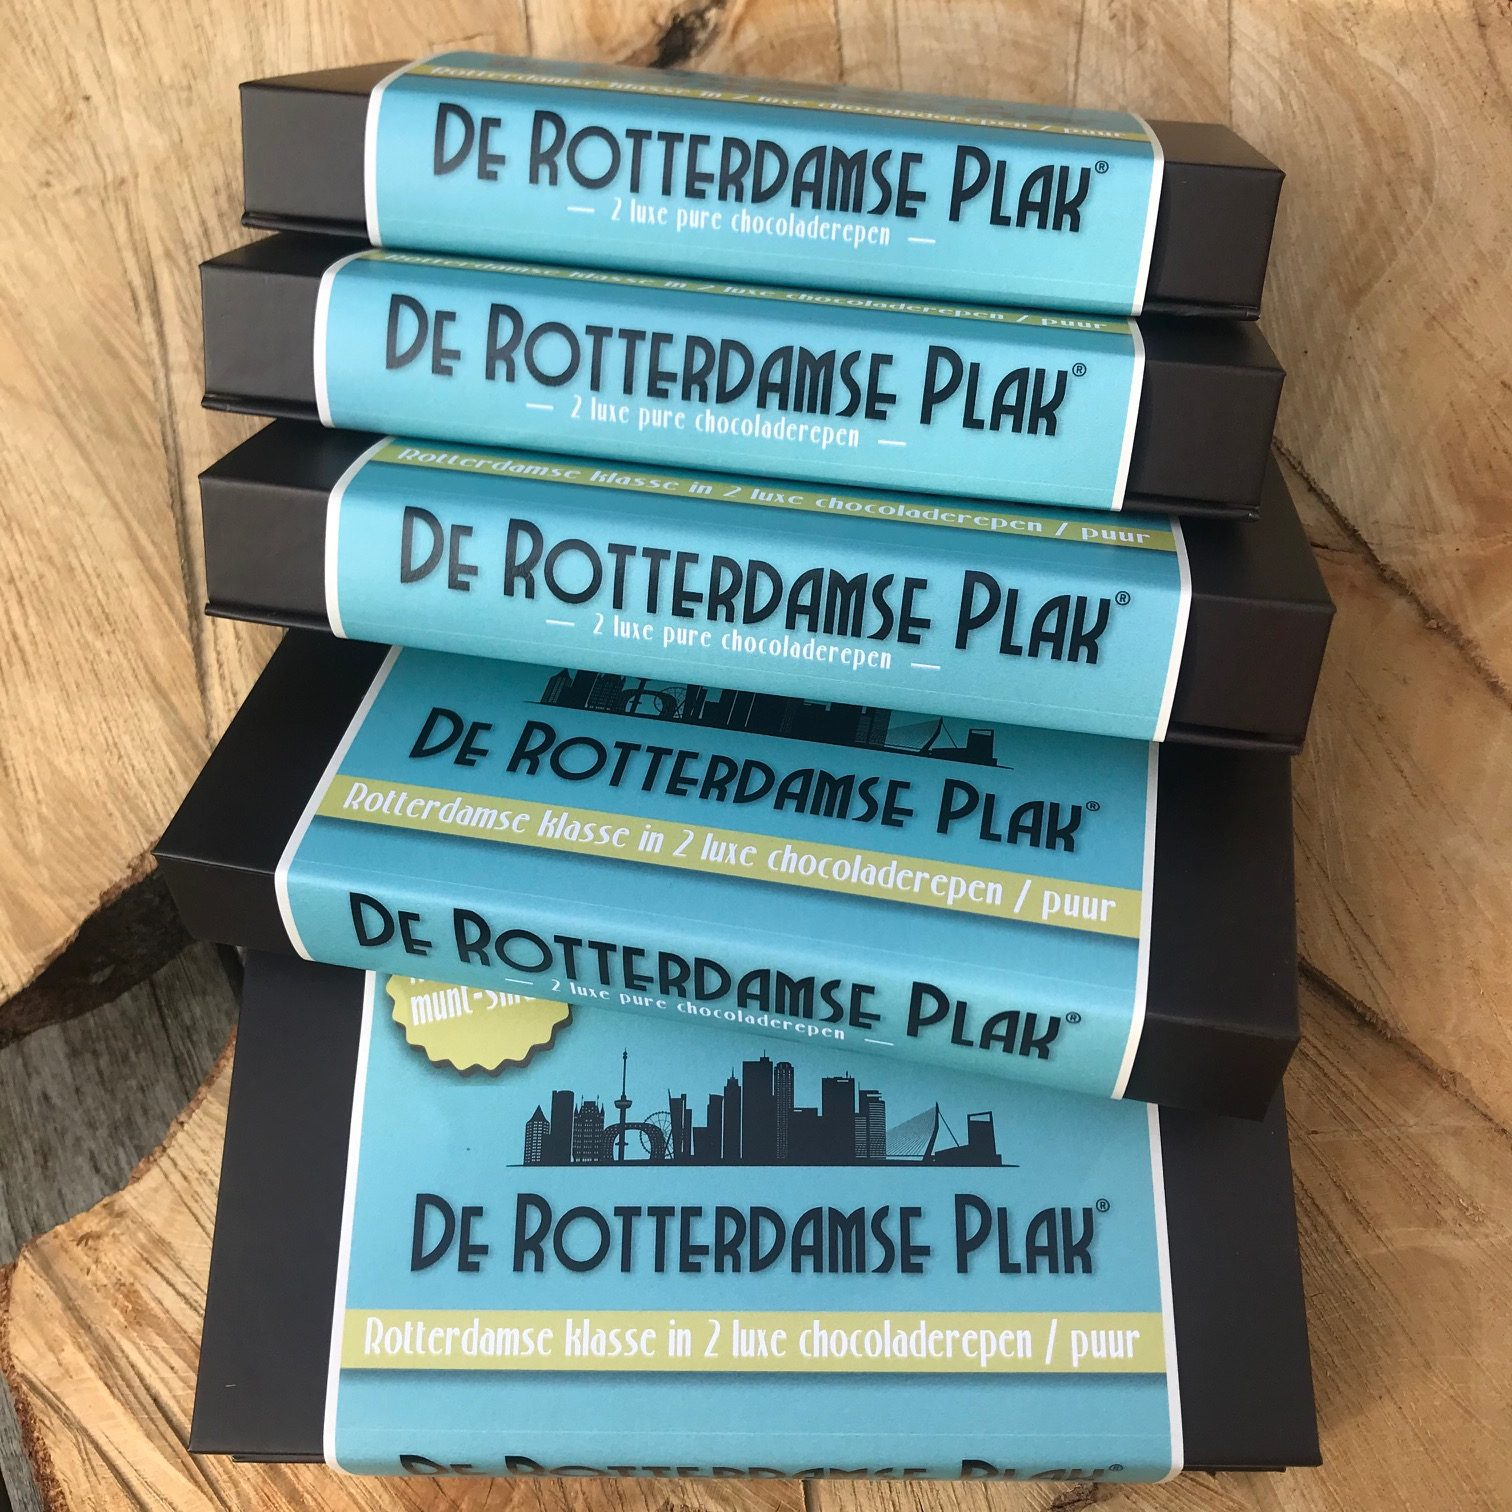 De Rotterdamse Plak by CARLZ